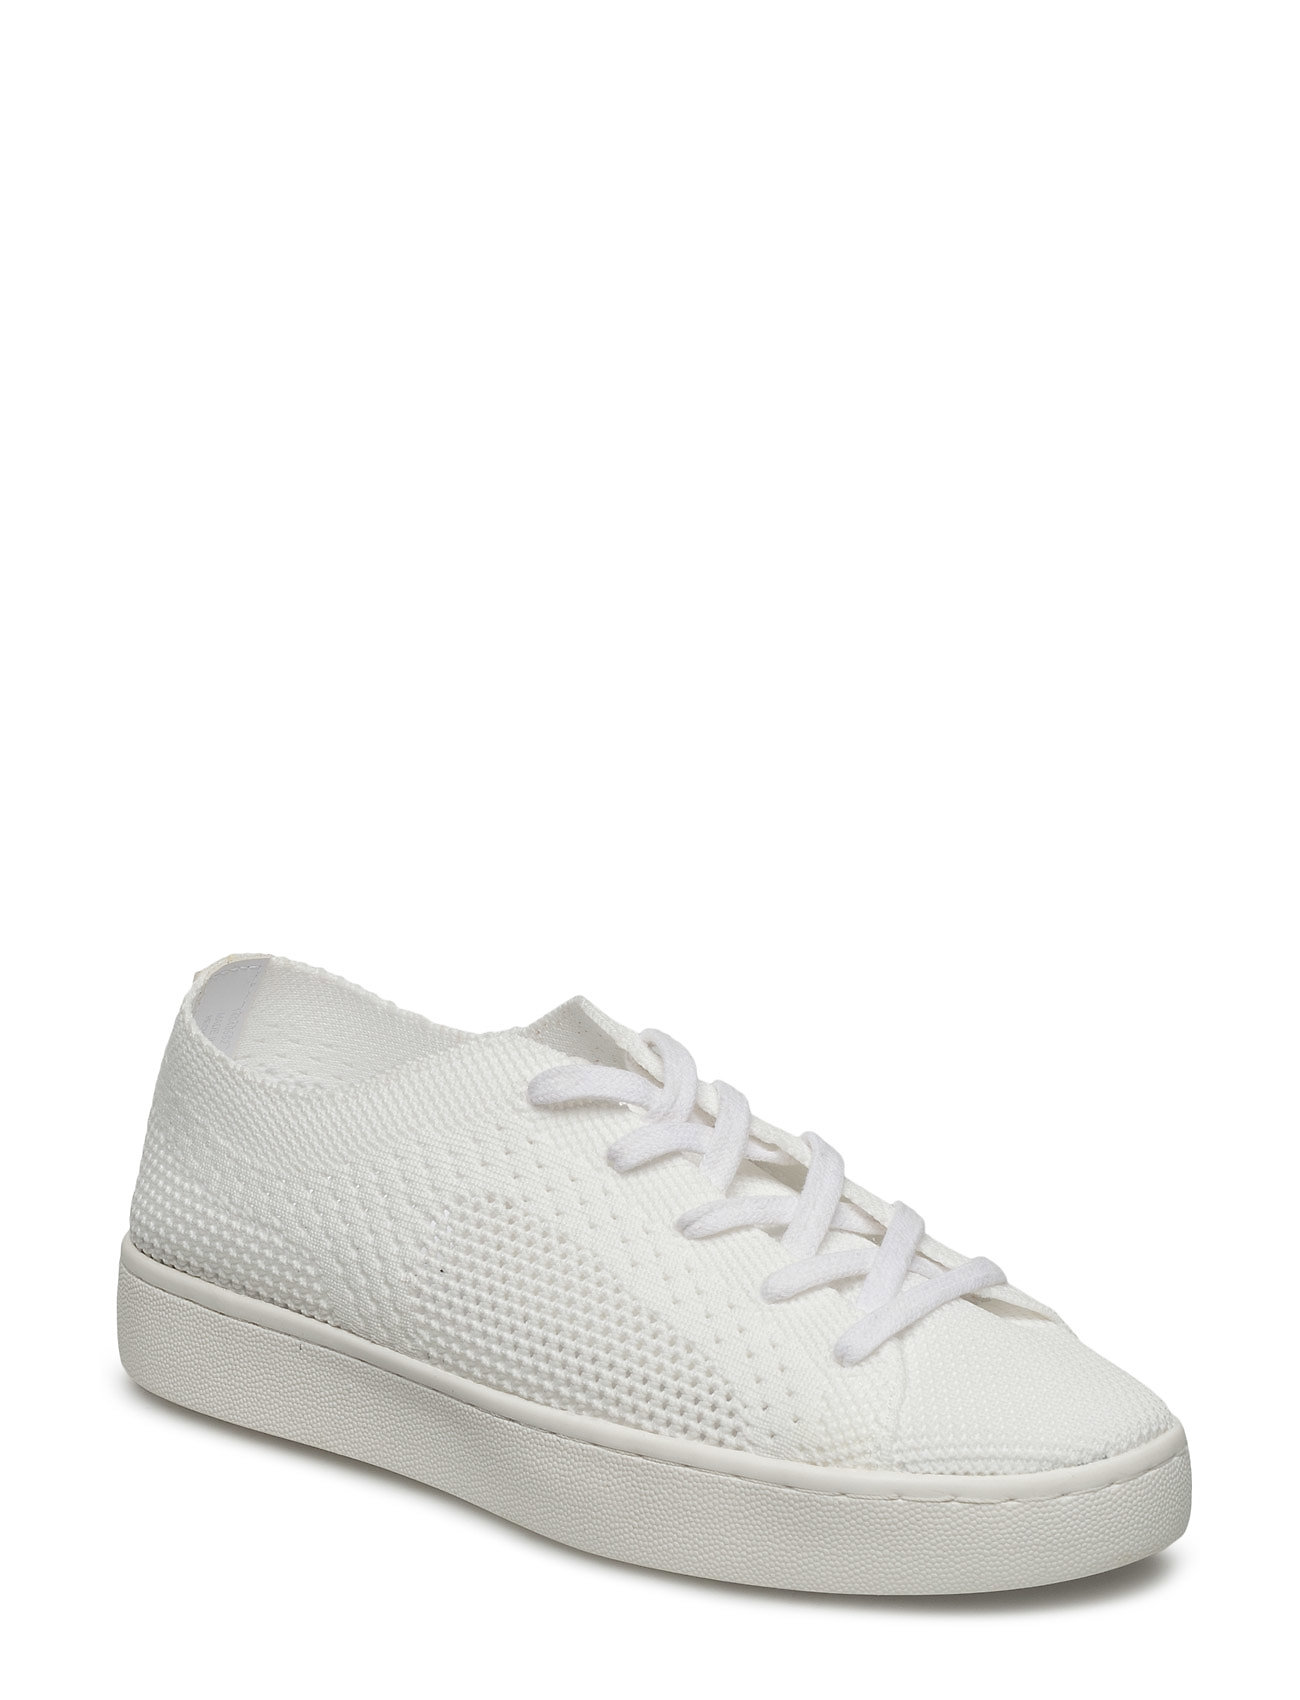 Mesh Sneakers Mango Sneakers til Damer i Natural White